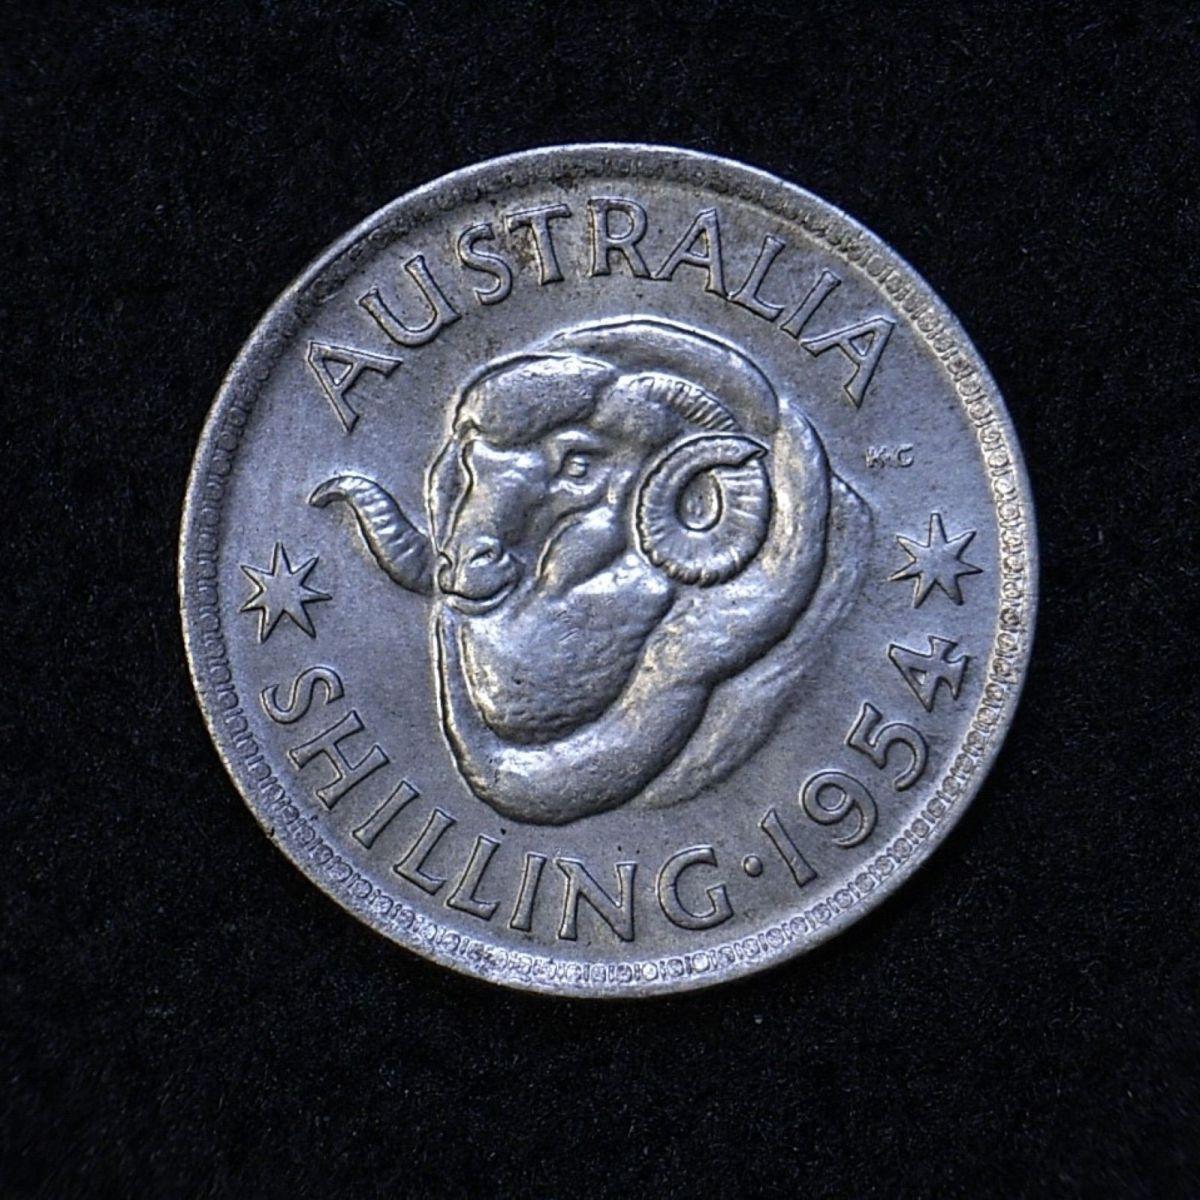 Close up Aus Shilling 1954 reverse